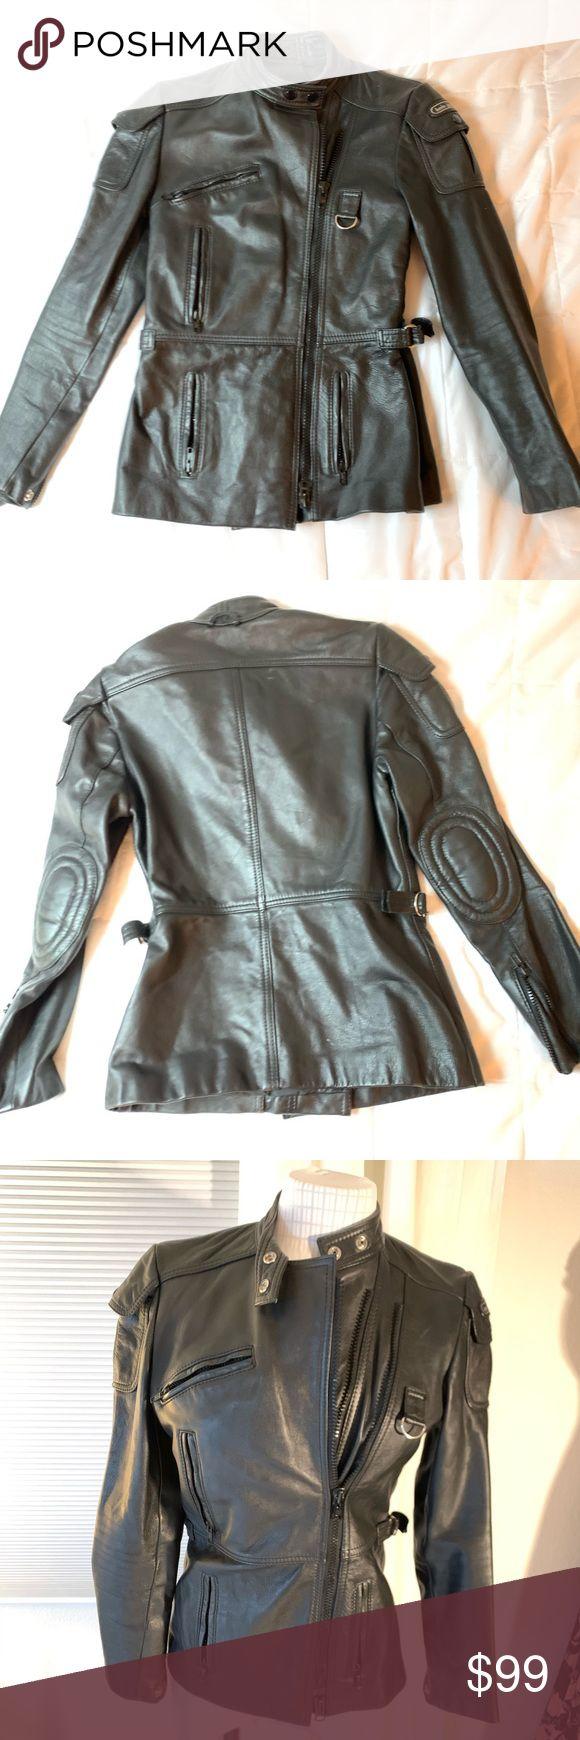 Hein Gericke Vintage Motorcycle Jacket Jackets